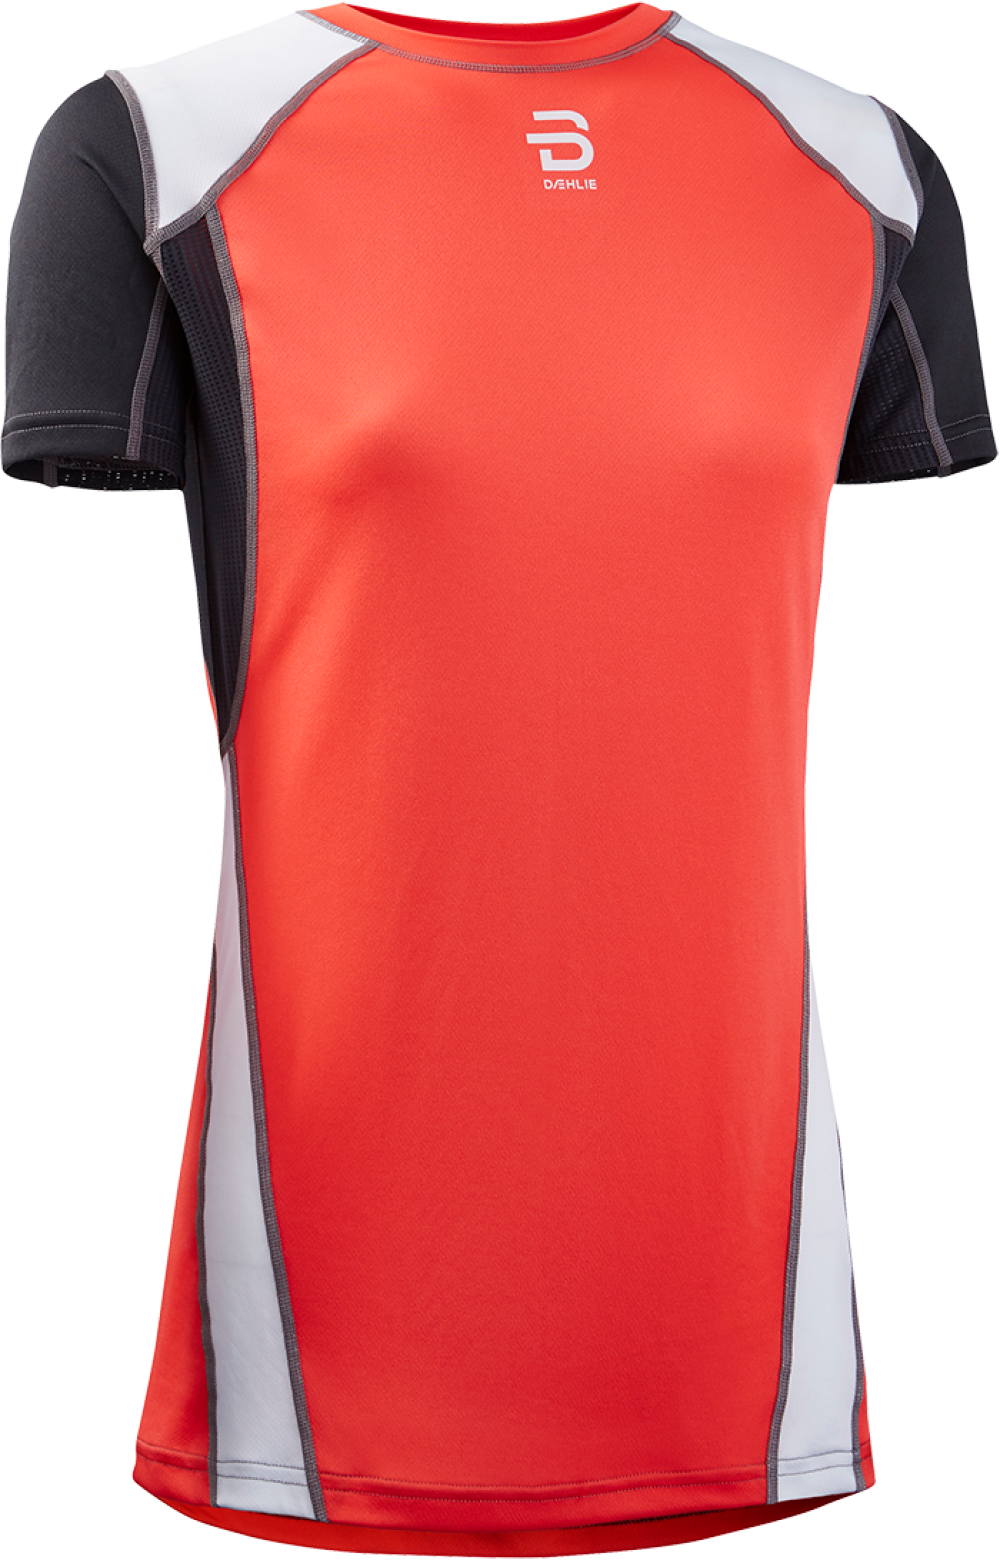 ... Bjørn Dæhlie T-Shirt Dry Women s Hot Coral ... b962d231c1a69